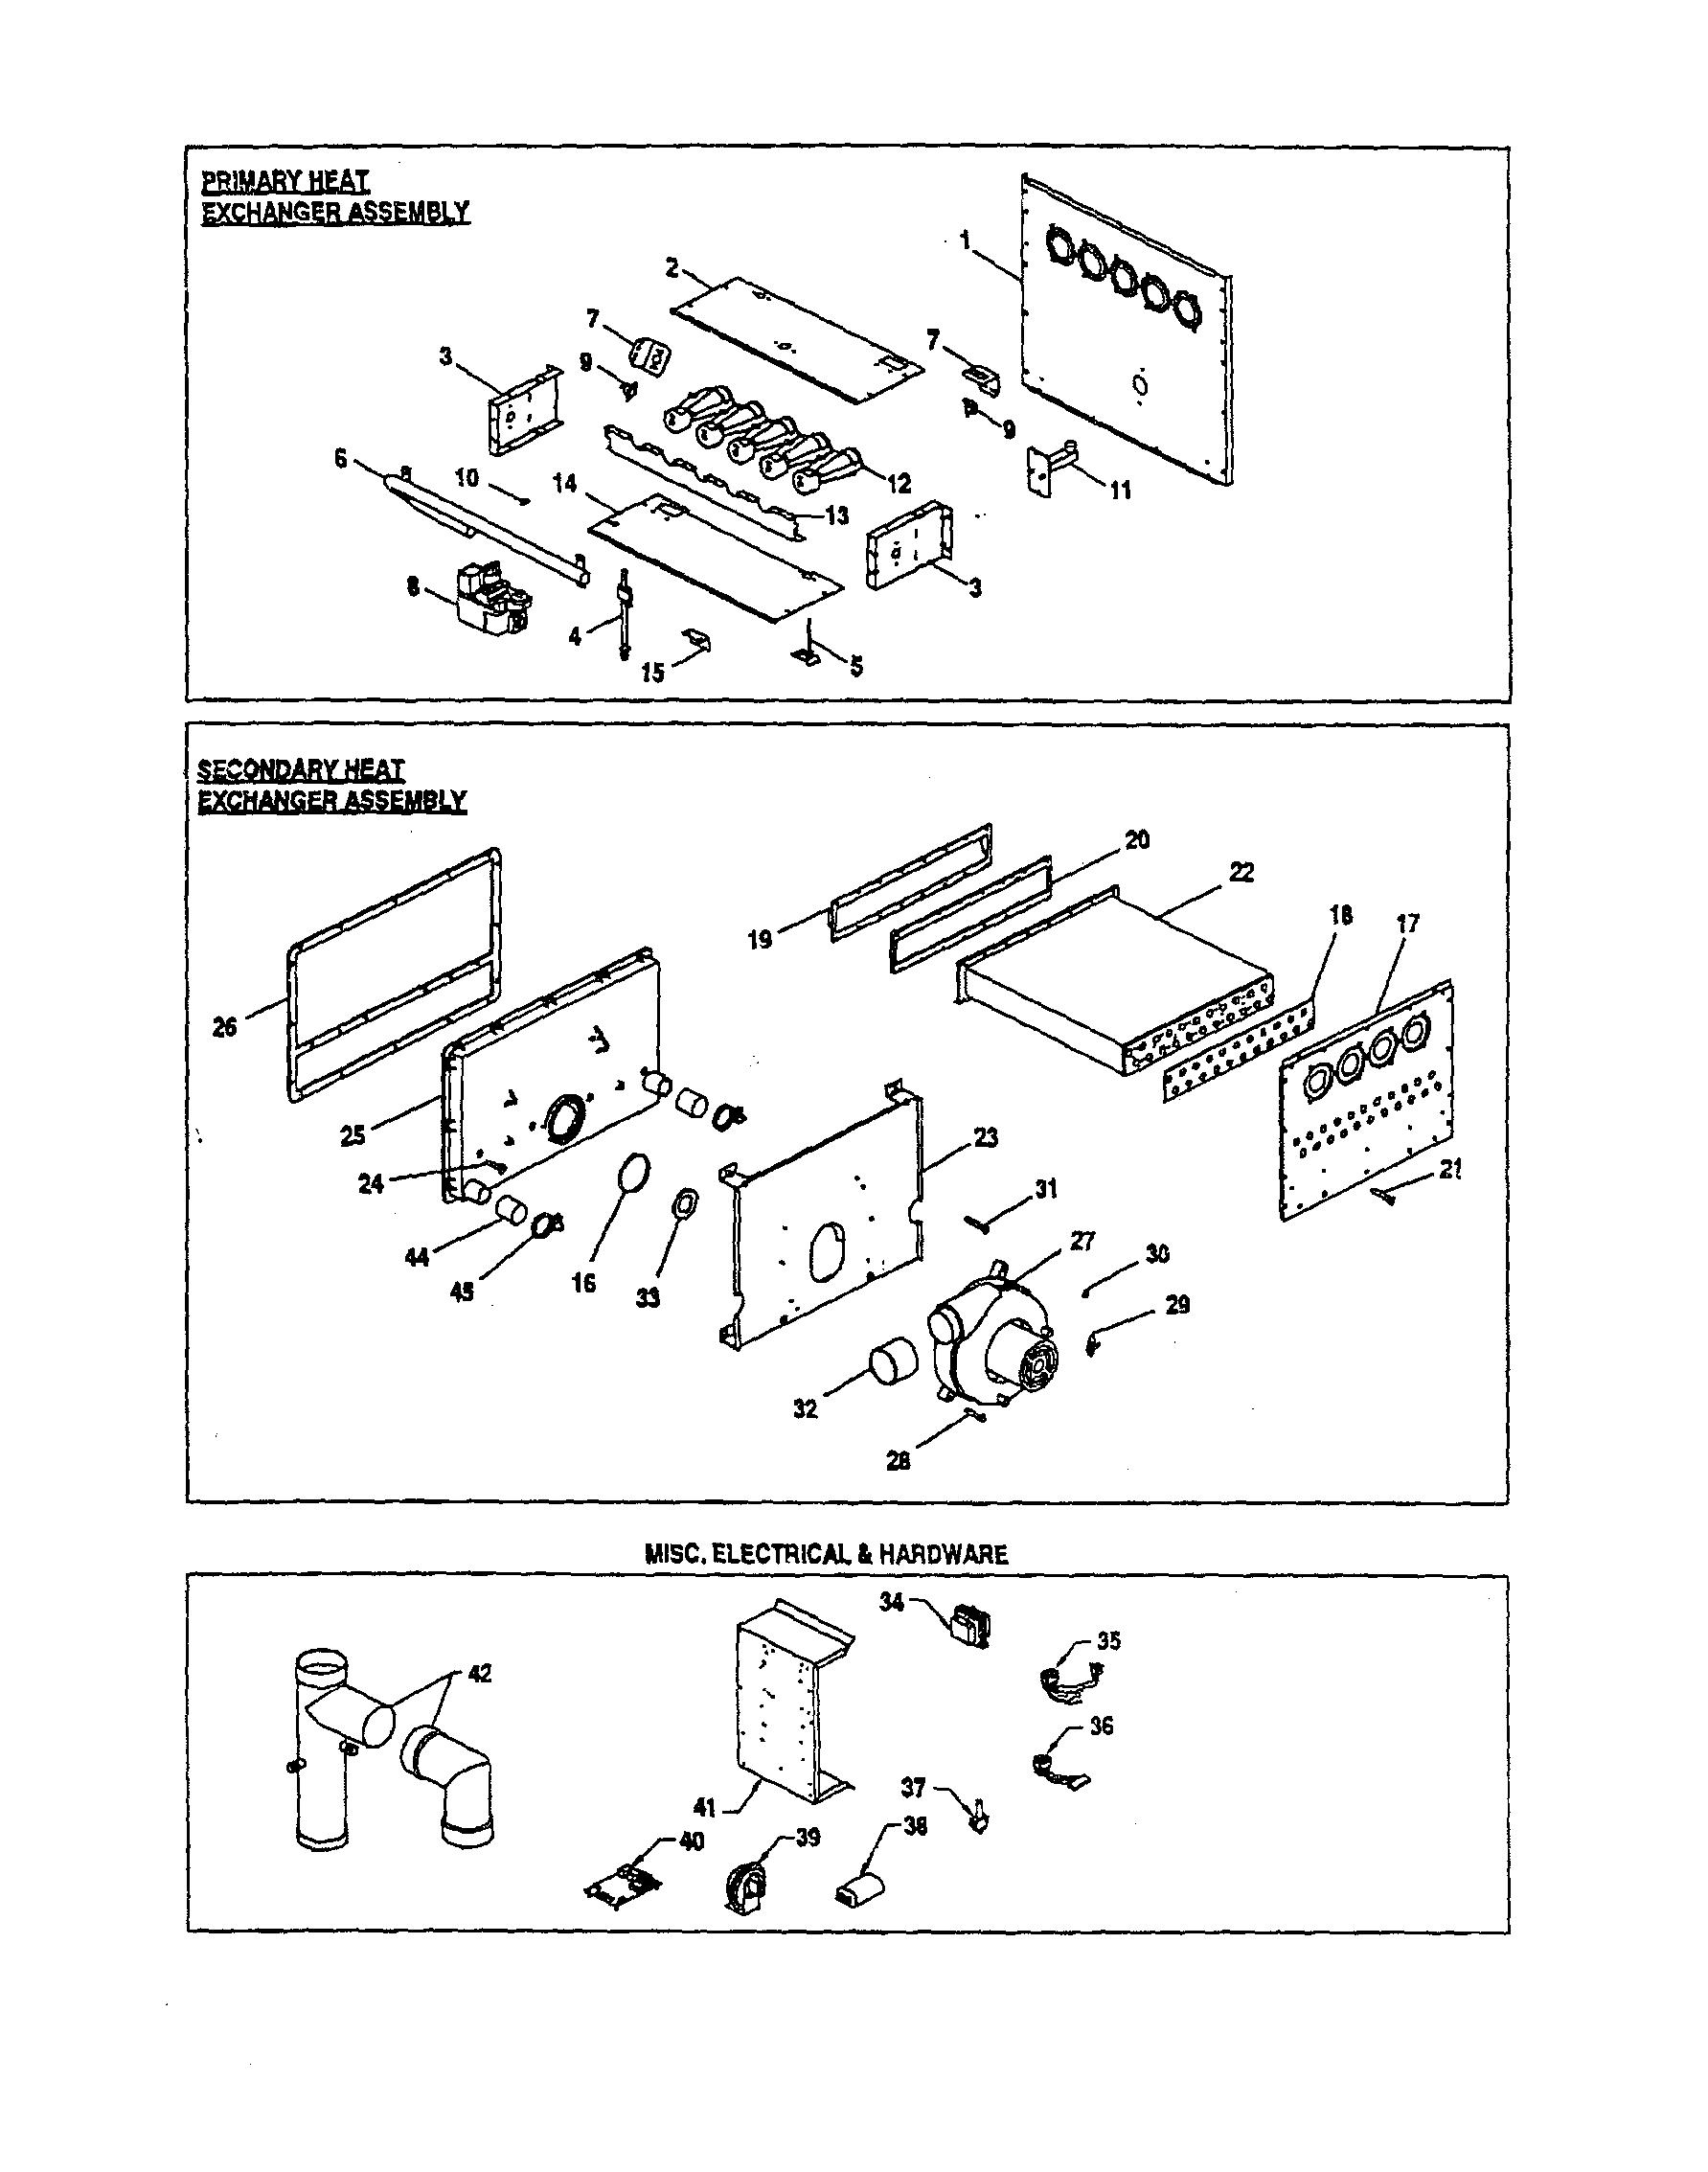 hight resolution of goodman gmn060 3 heat exchangers misc electrical diagram